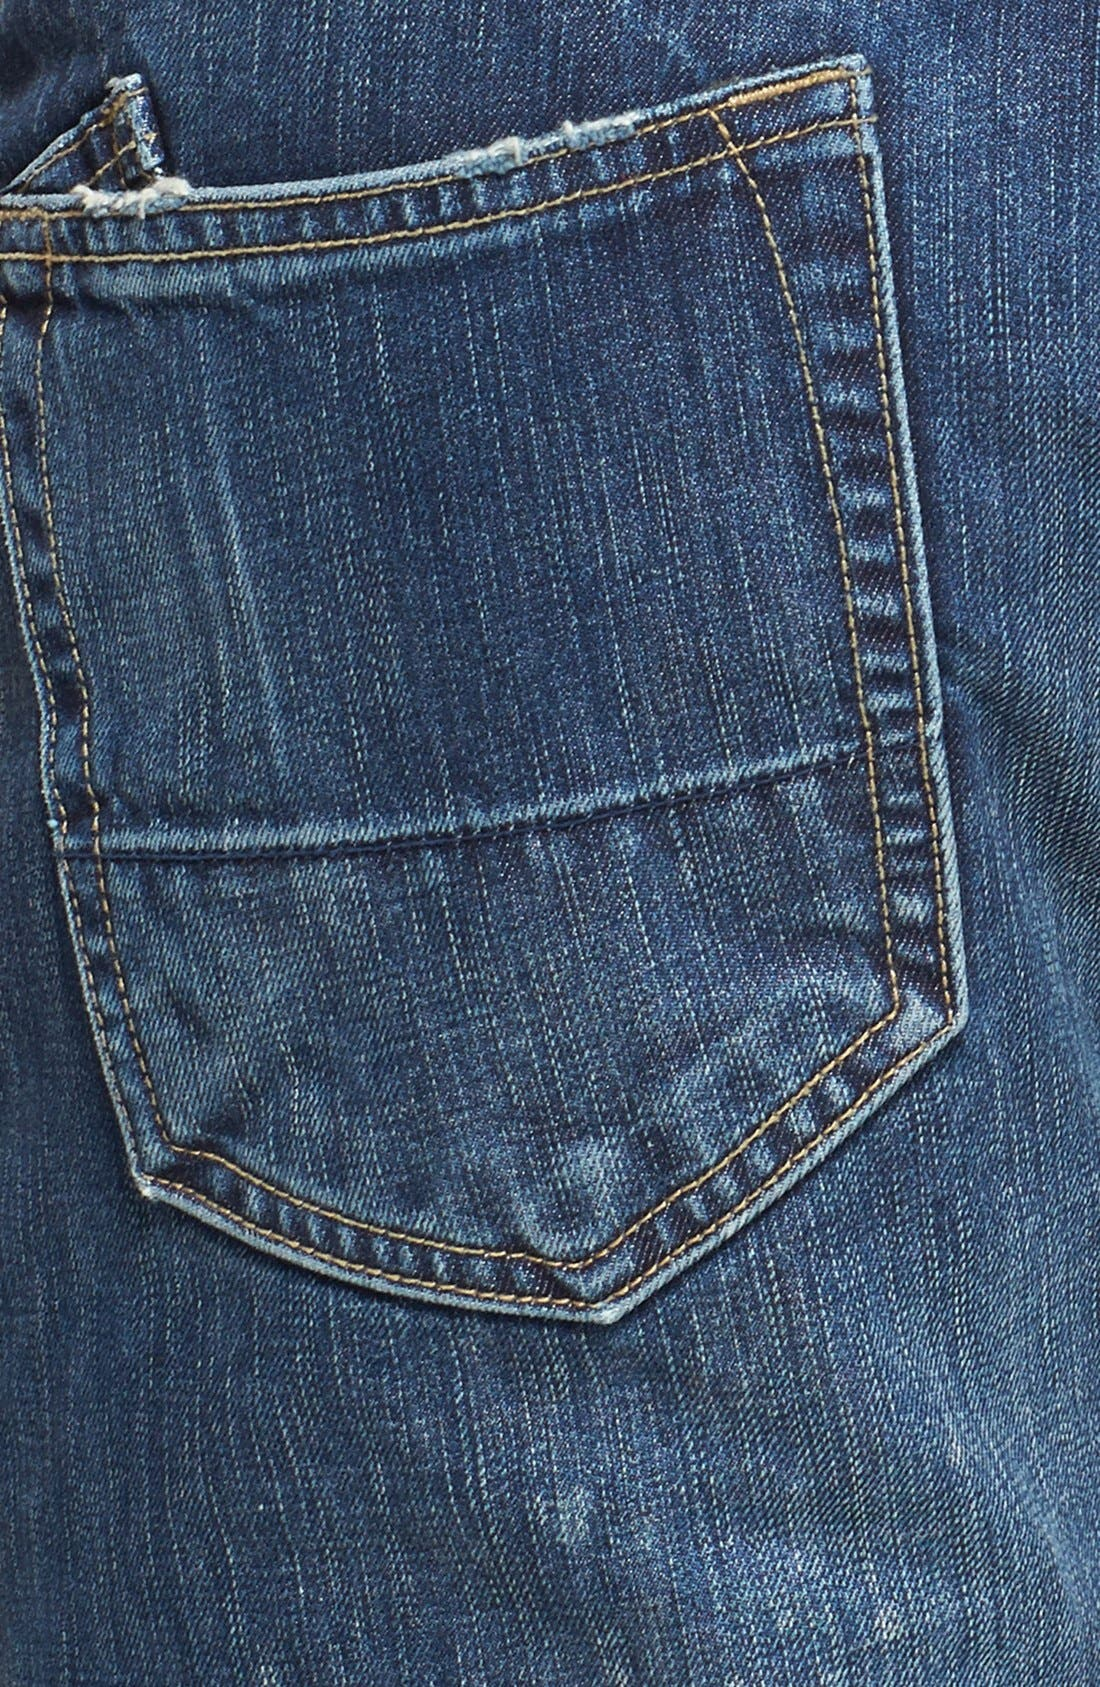 Alternate Image 4  - PRPS 'Demon' Straight Leg Jeans (Enzyme)